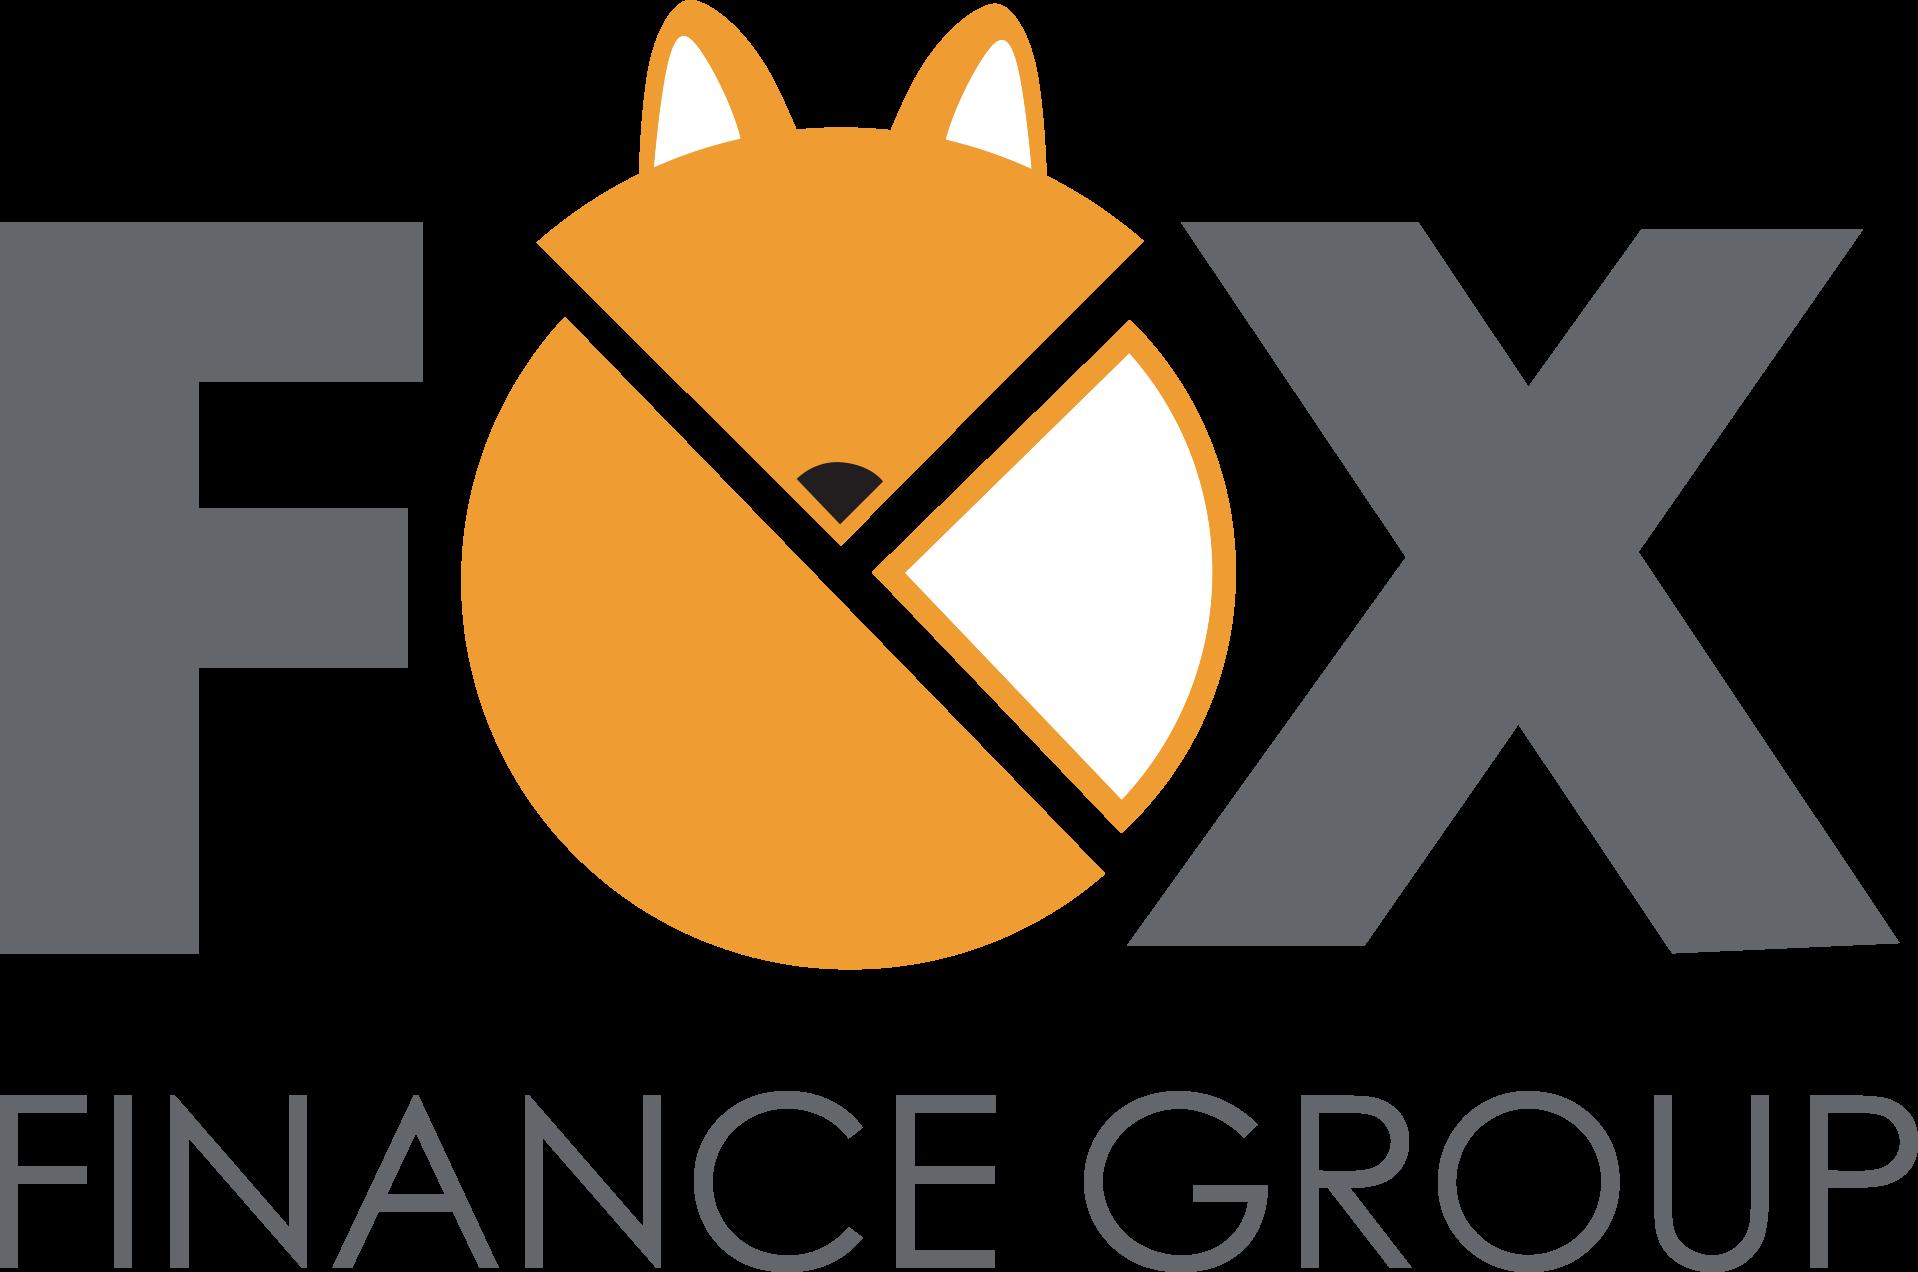 Fox Finance Group